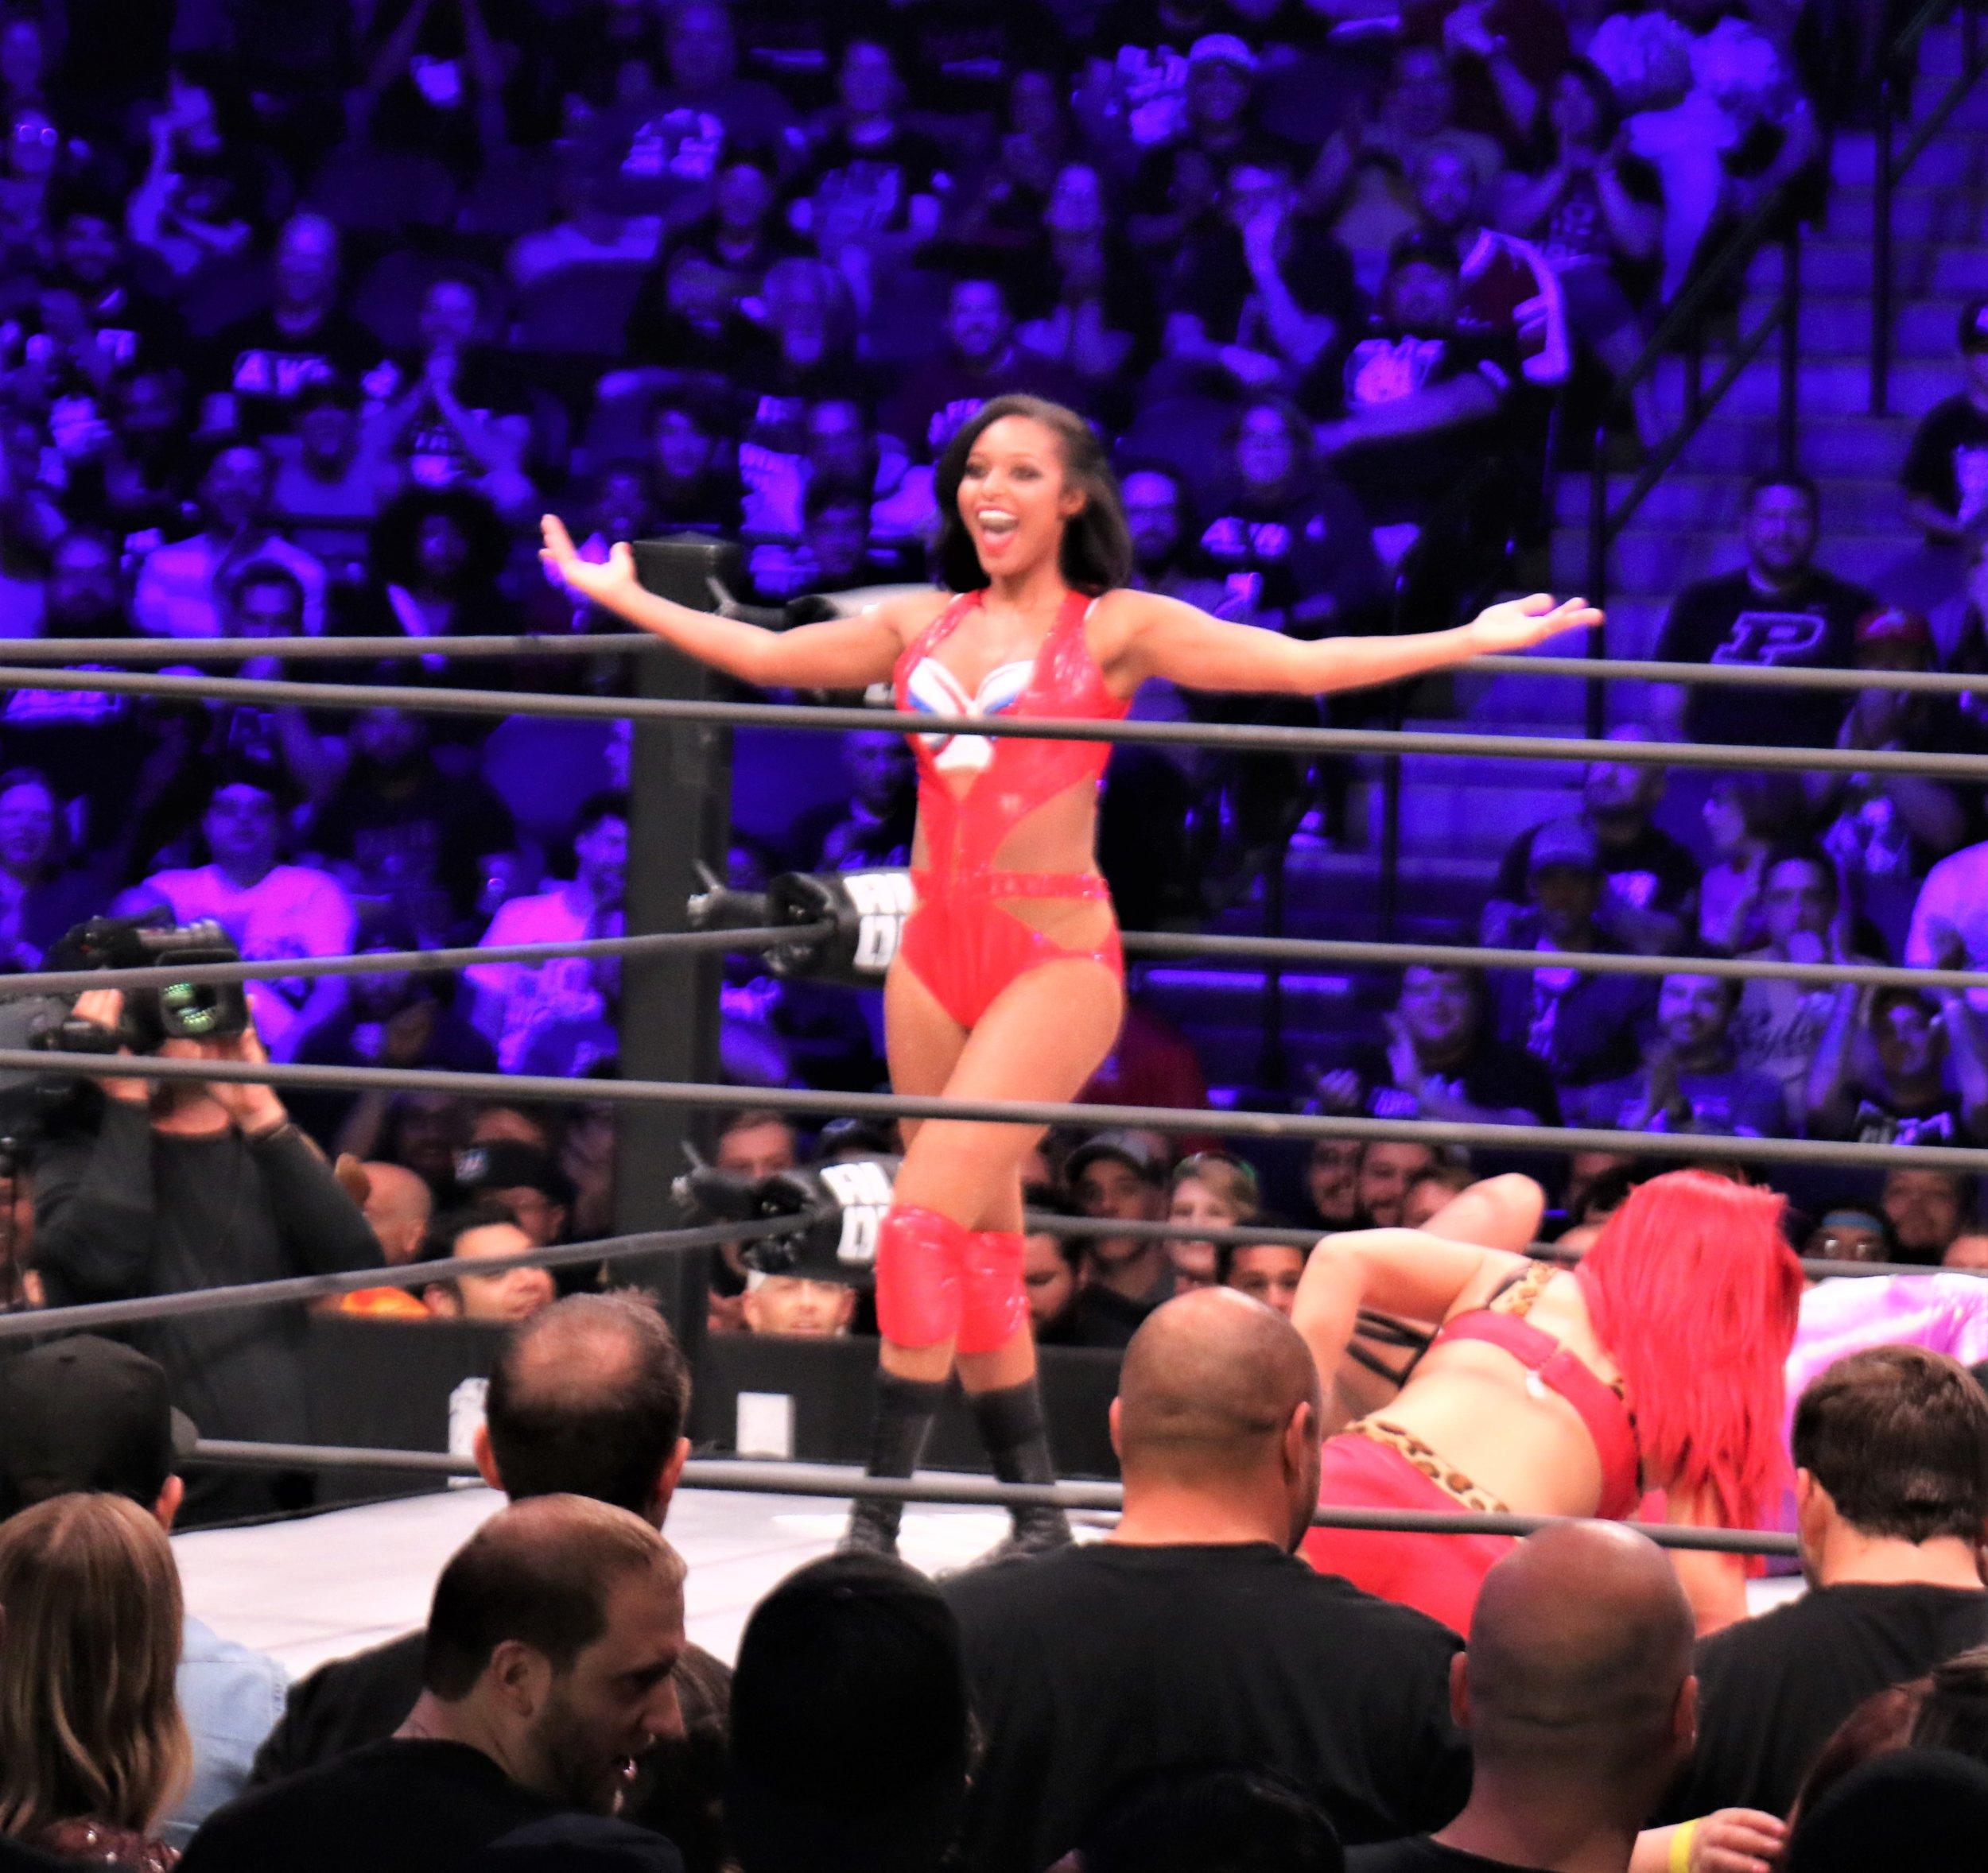 Brandi Rhodes struts her stuff during the Casino Battle Royale.